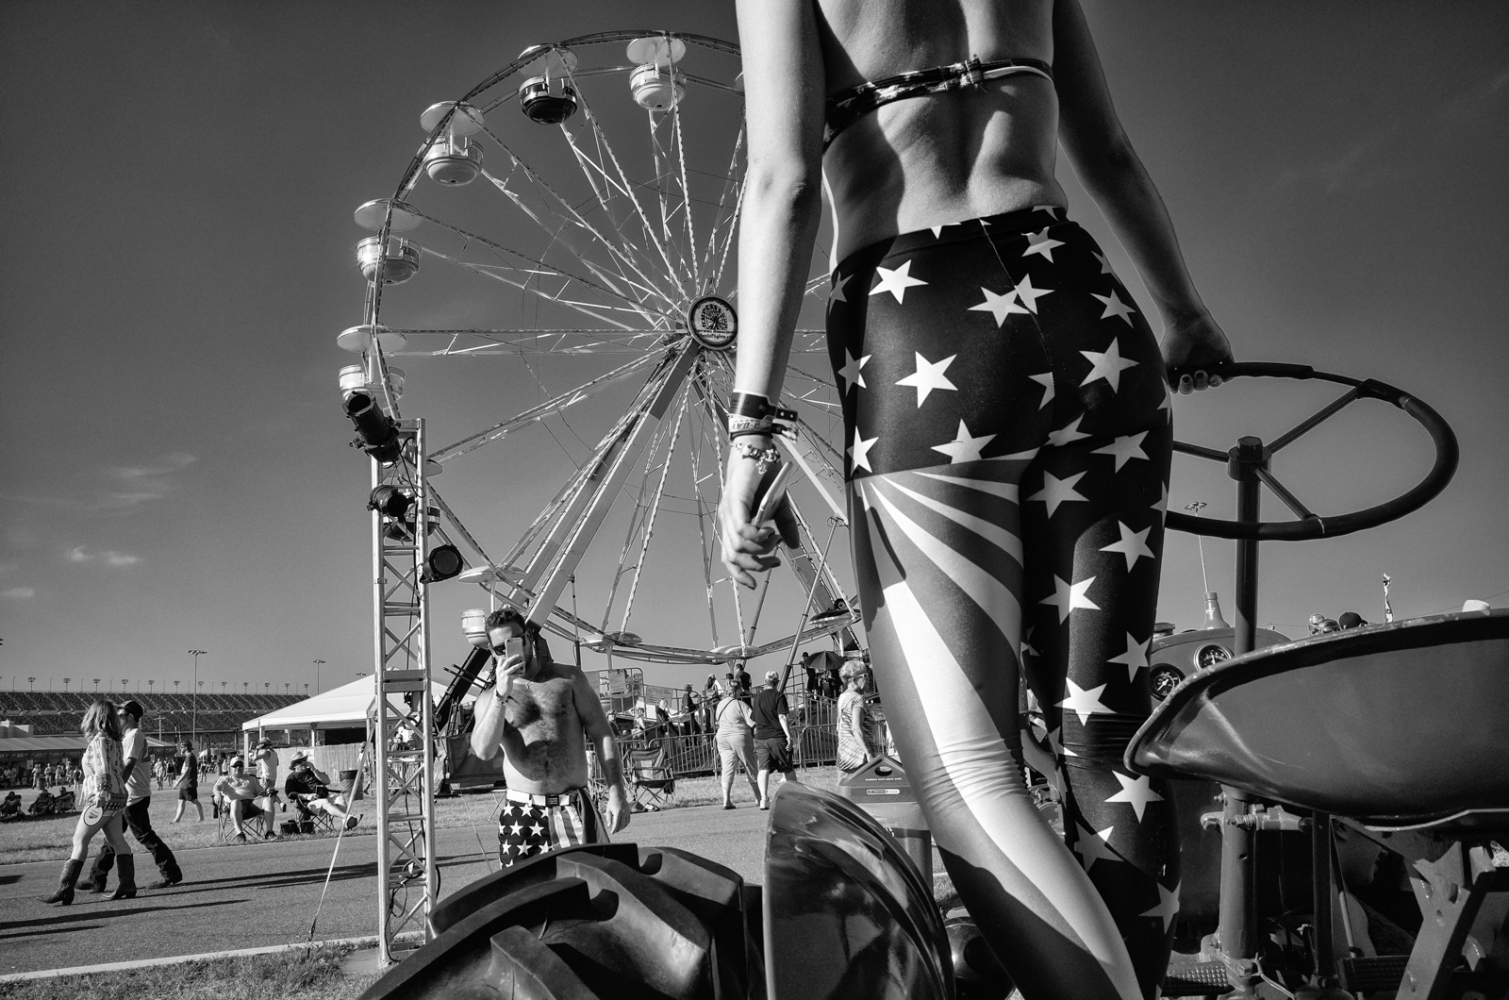 American Flag Fashions Country 500 music festival, Daytona International Speedway, Daytona Florida